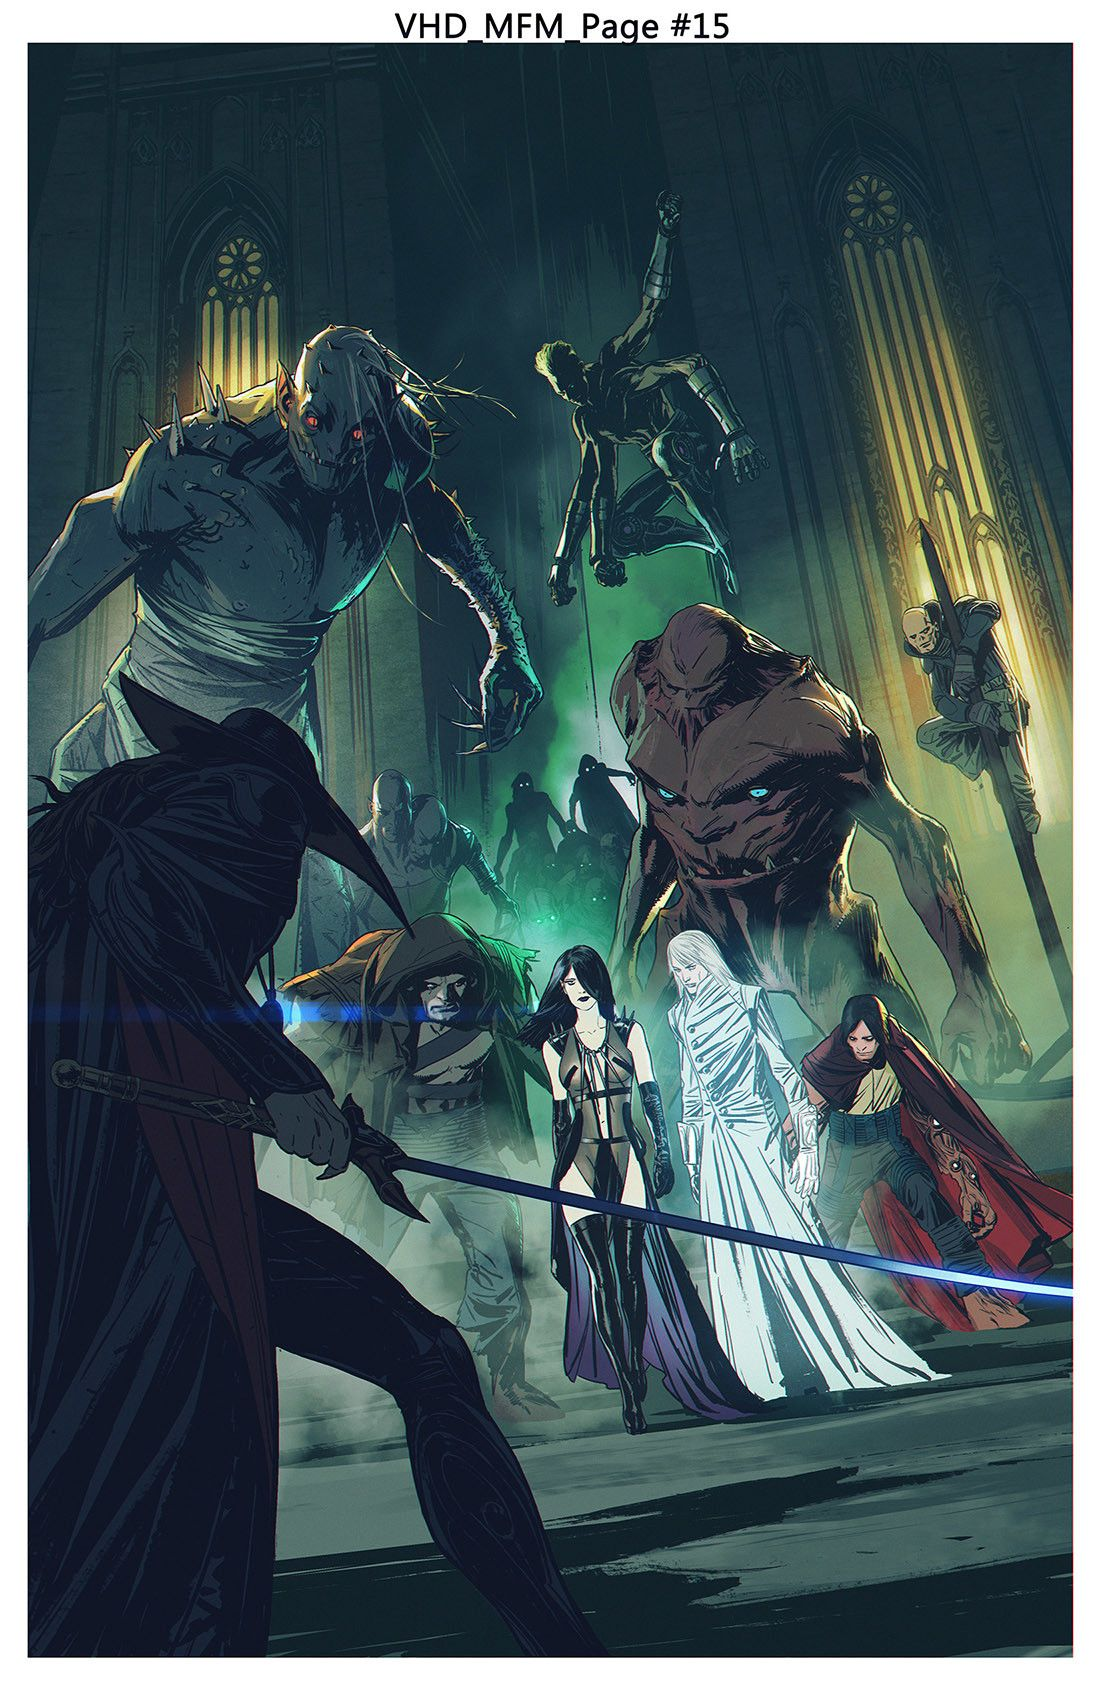 Artstation Vampire Hunter D Message From Mars 2nd Stand Off Michael Broussard Diseno De Personajes Arte Fantasia Dibujos